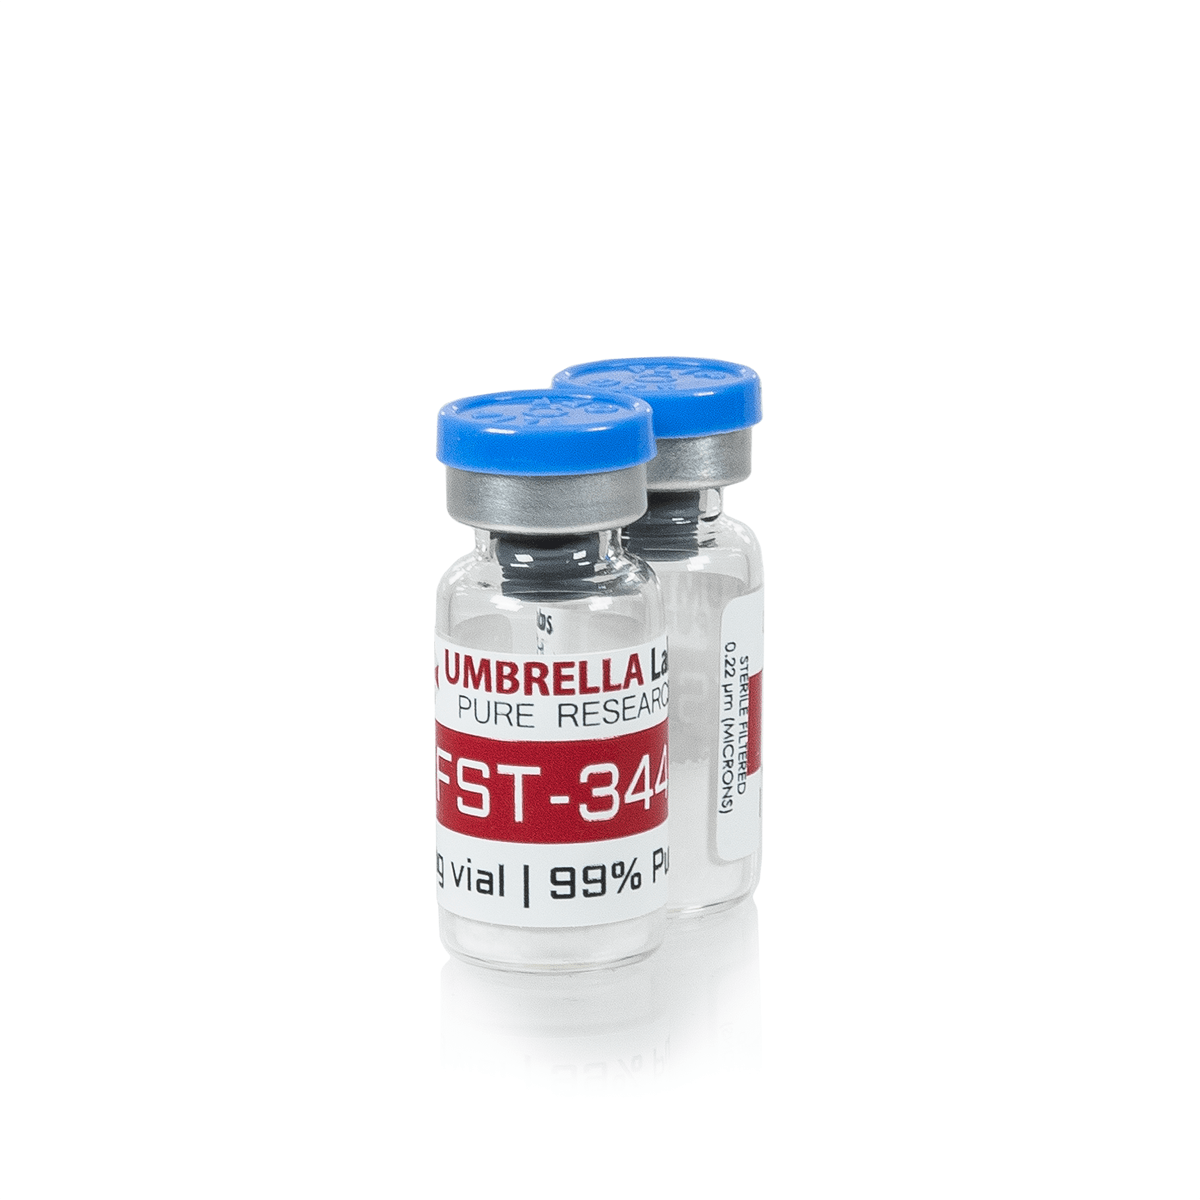 FOLLISTATIN 344 (FST-344) PEPTIDE 1MG VIAL